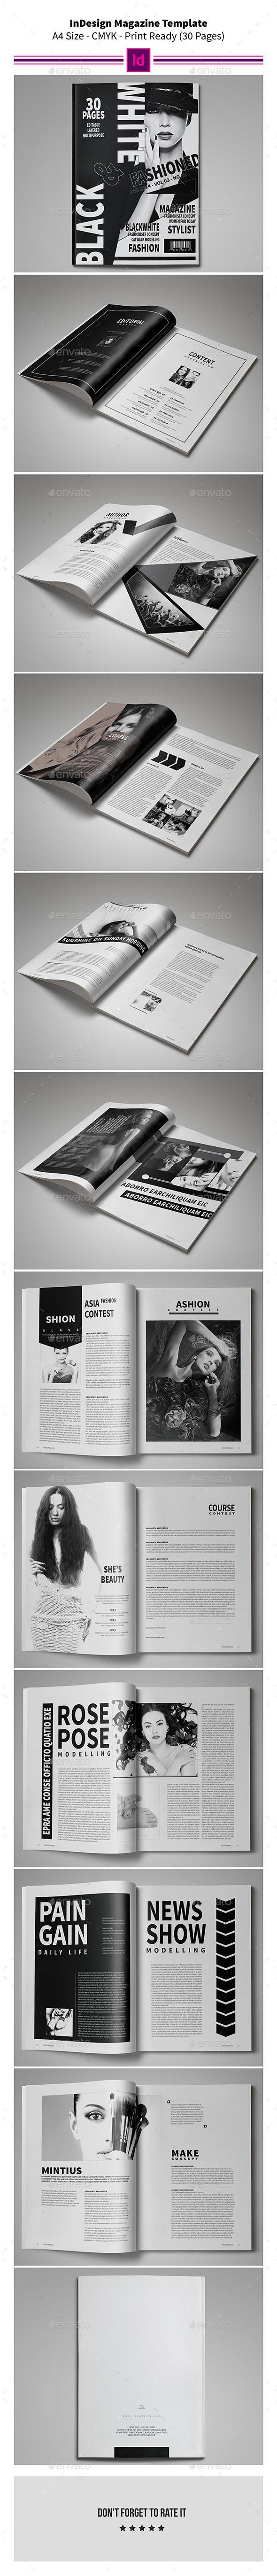 Black & White Magazine Template - Magazines Print Templates